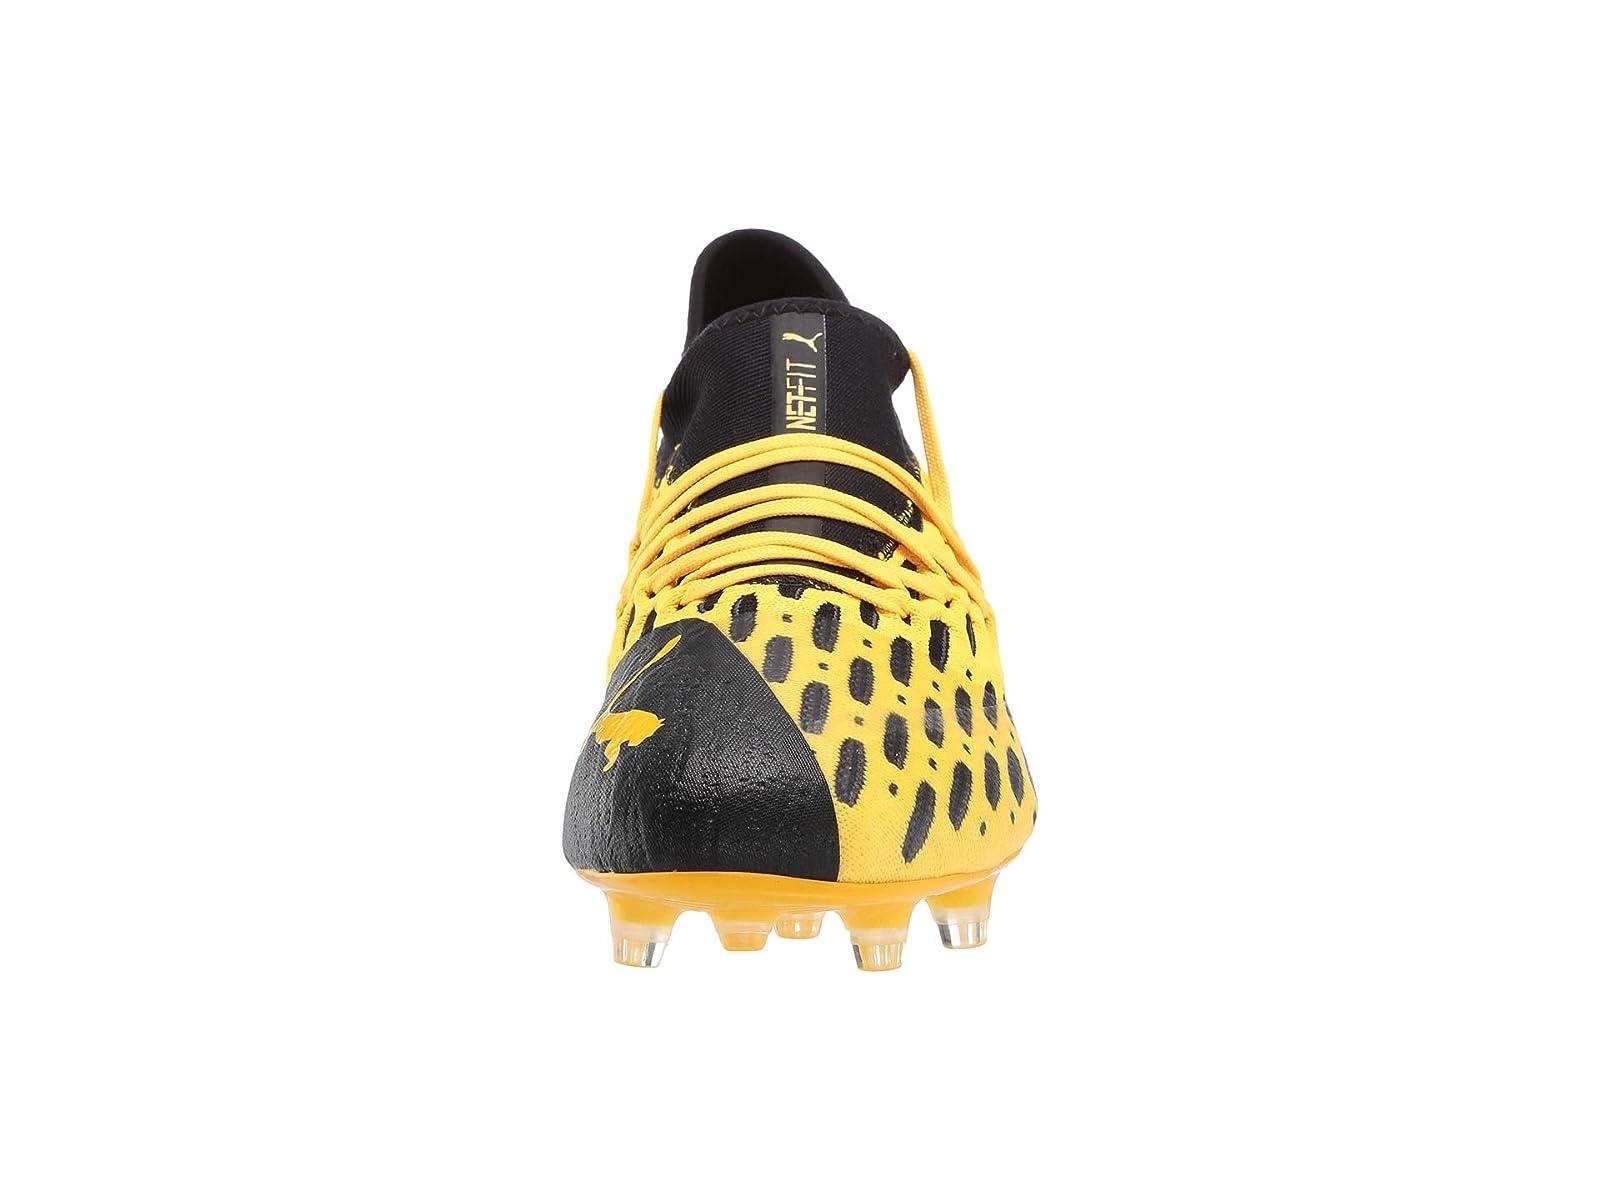 Man-039-s-Sneakers-amp-Athletic-Shoes-PUMA-Future-5-2-Netfit-FG-AG thumbnail 22